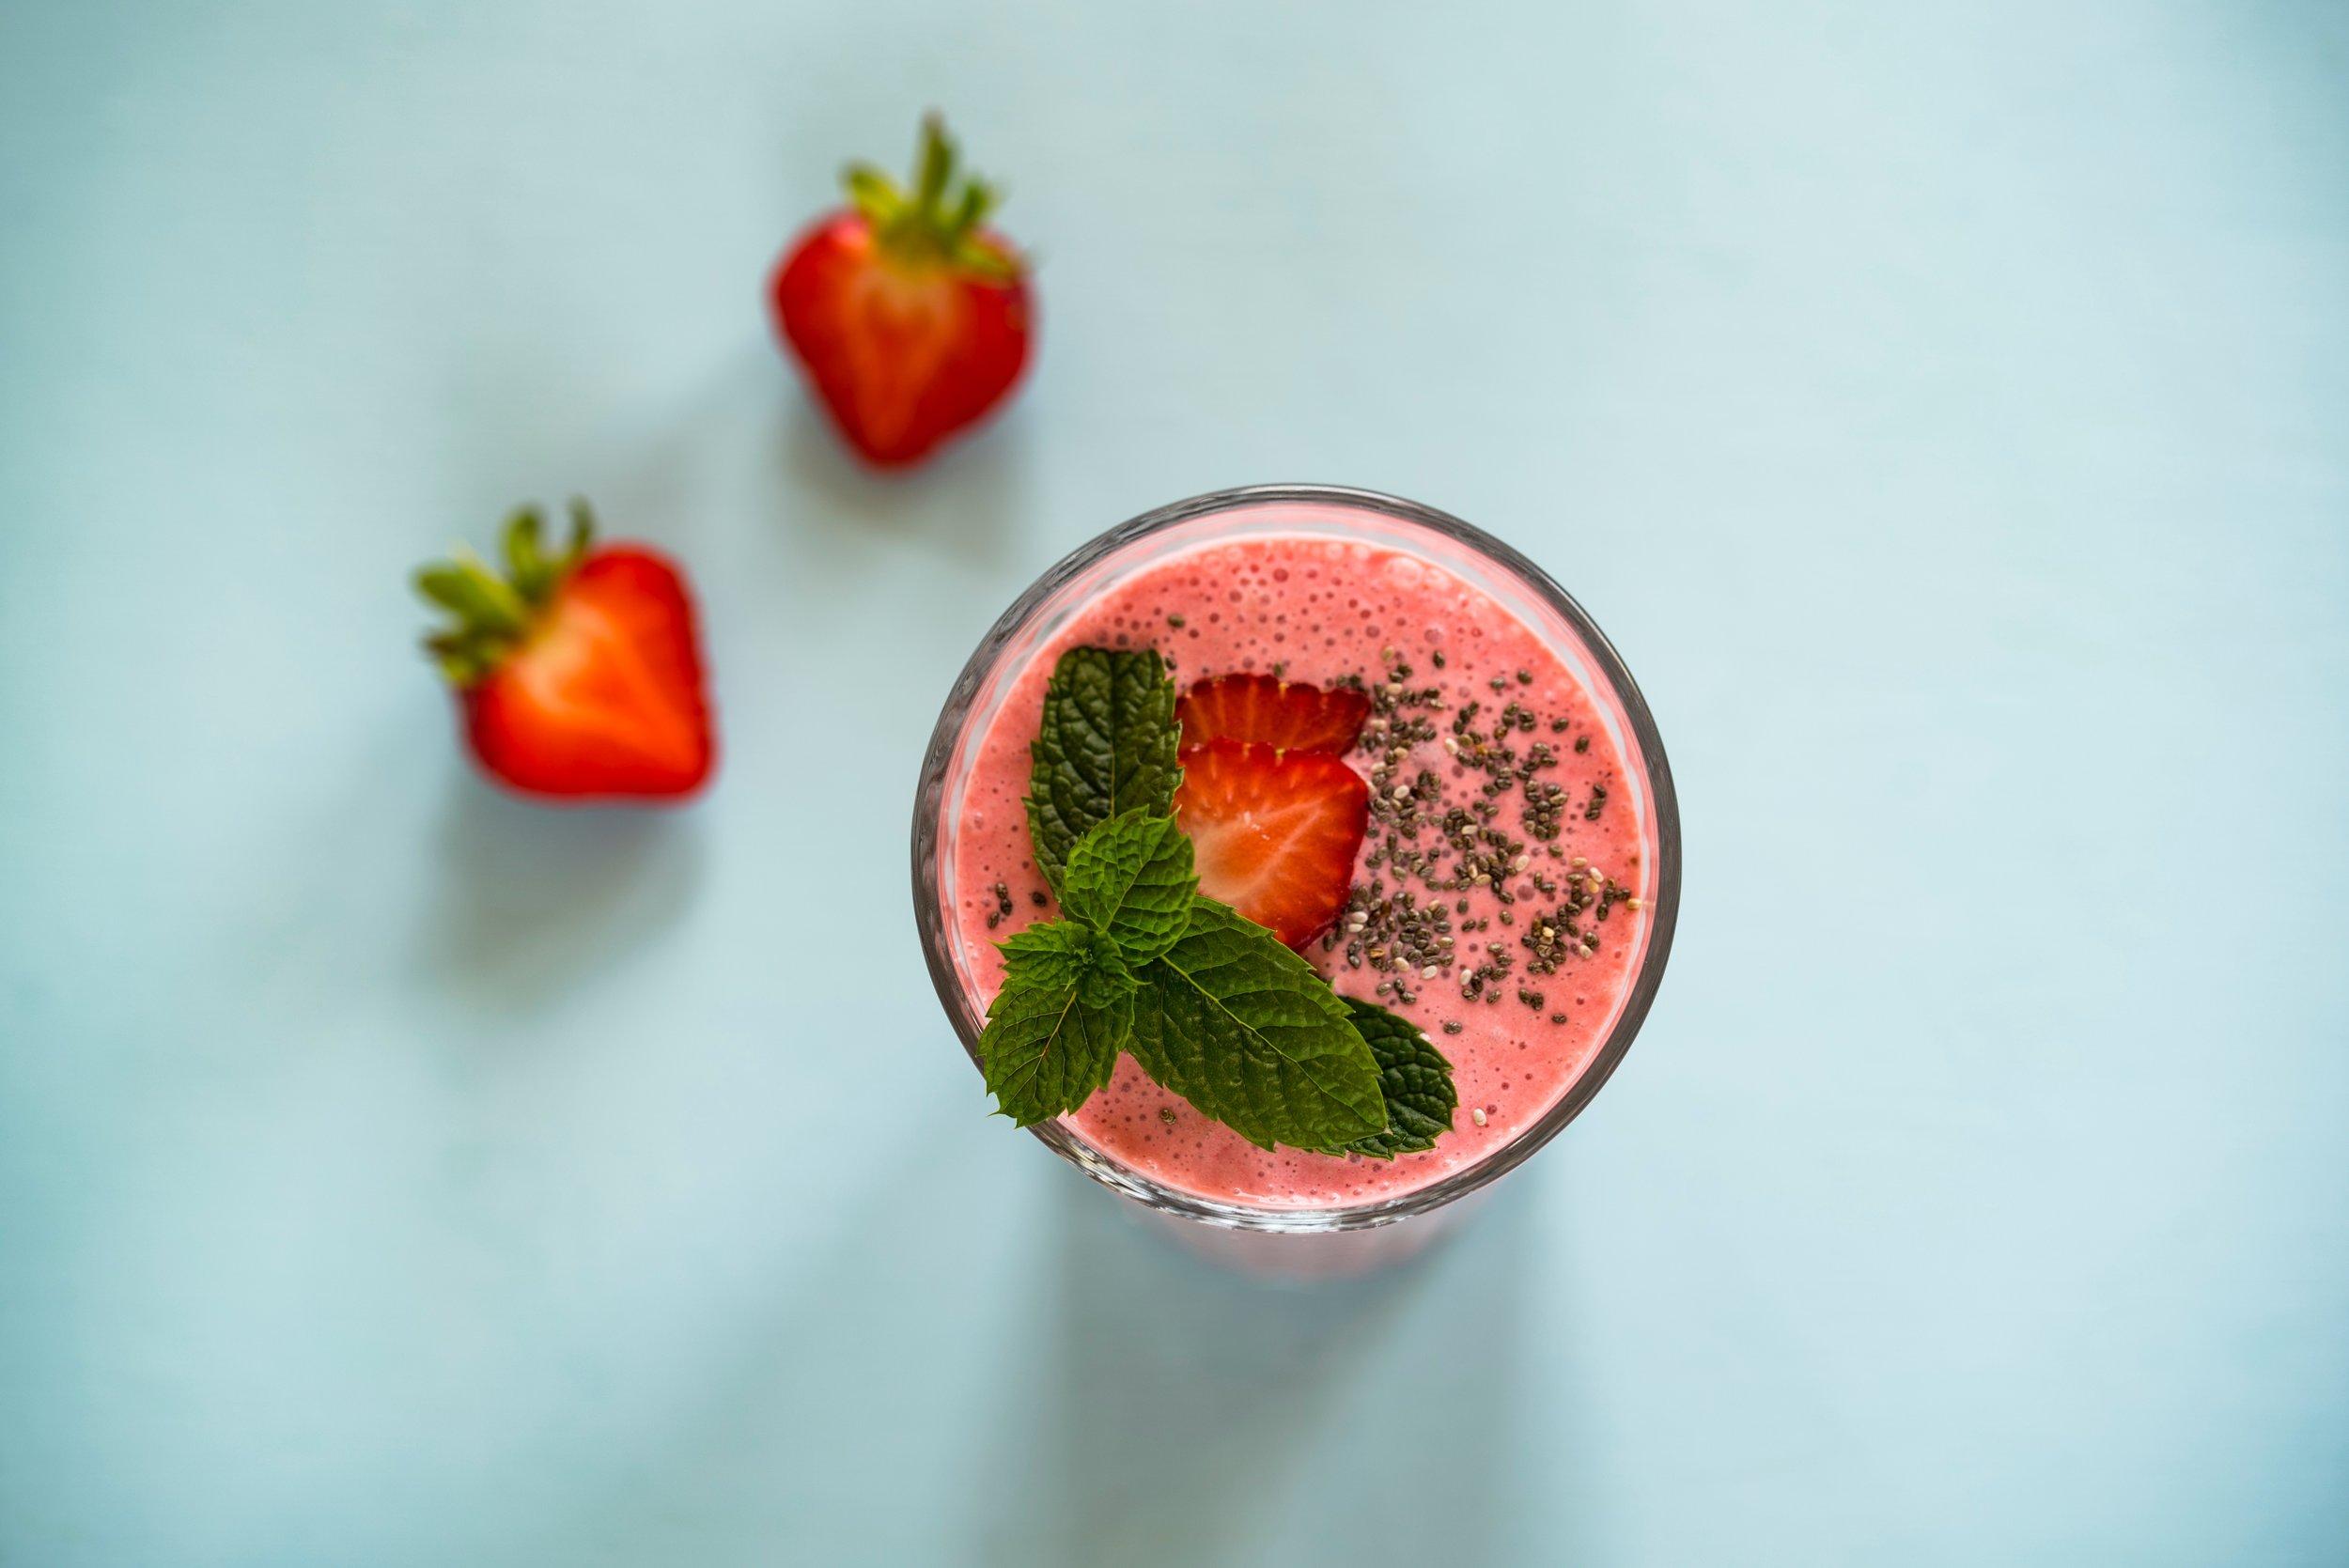 strawberrysmoothierecipe.jpg